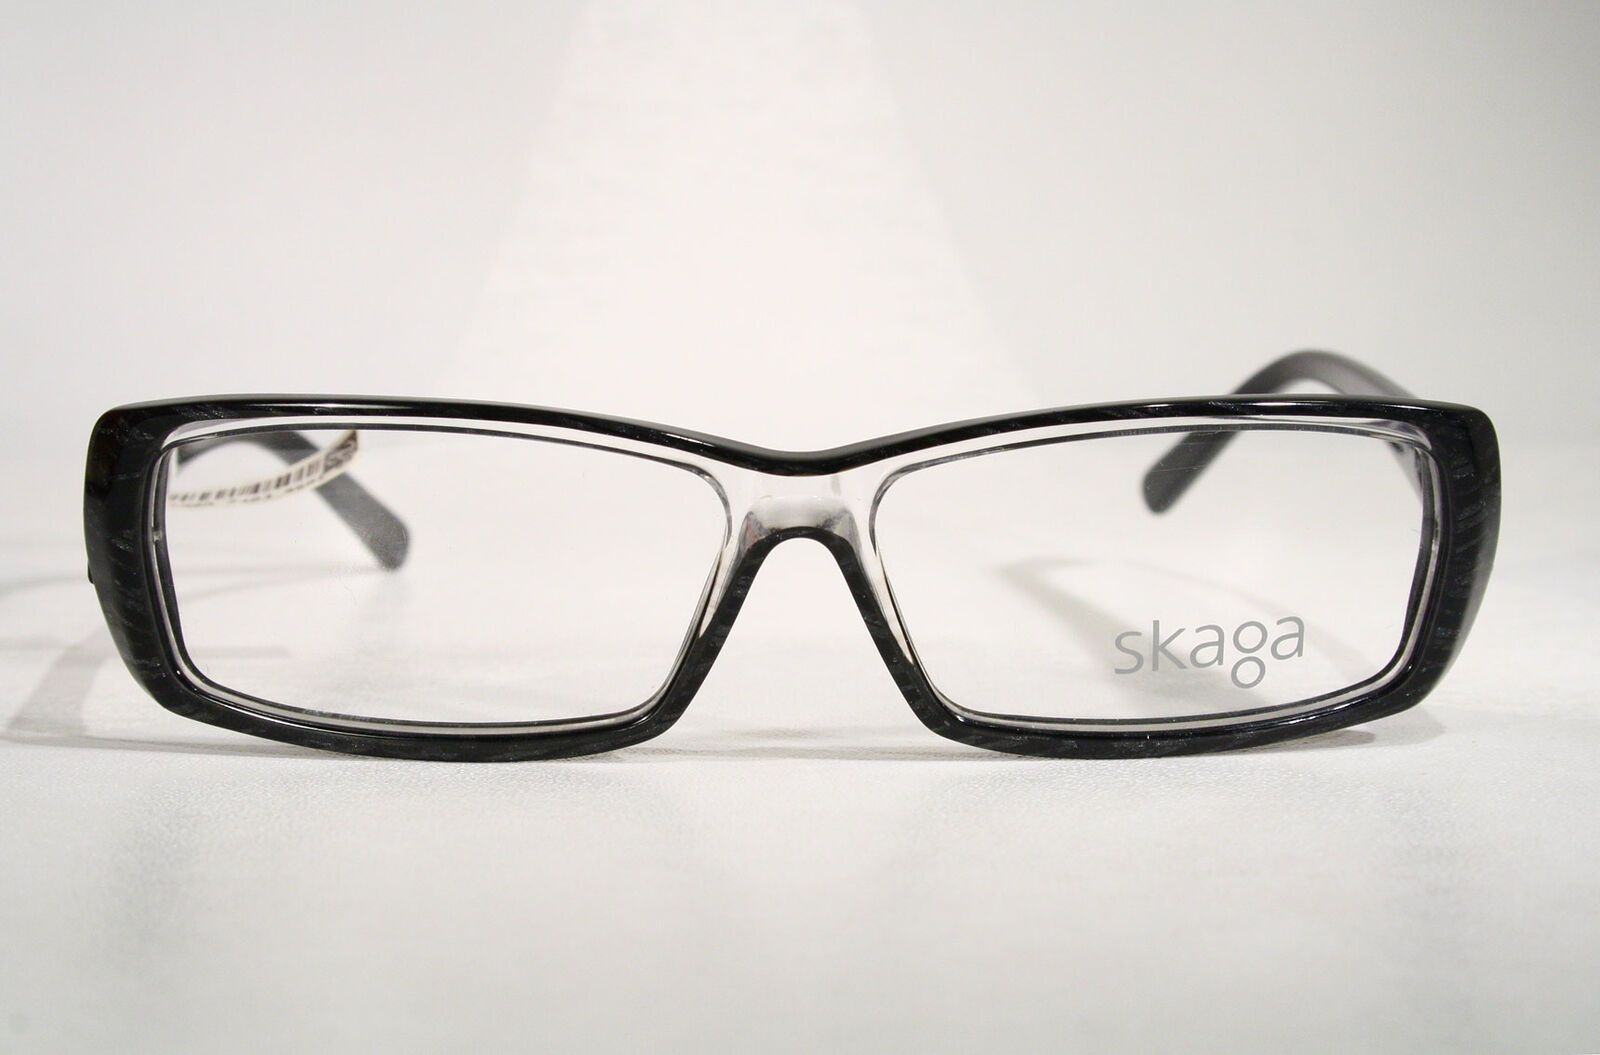 29e104e7bdc Plastic SKAGA Smart Unisex Scandinavian Clear   Gray Eyeglass Frames Glasses    eBay (RipVanW)